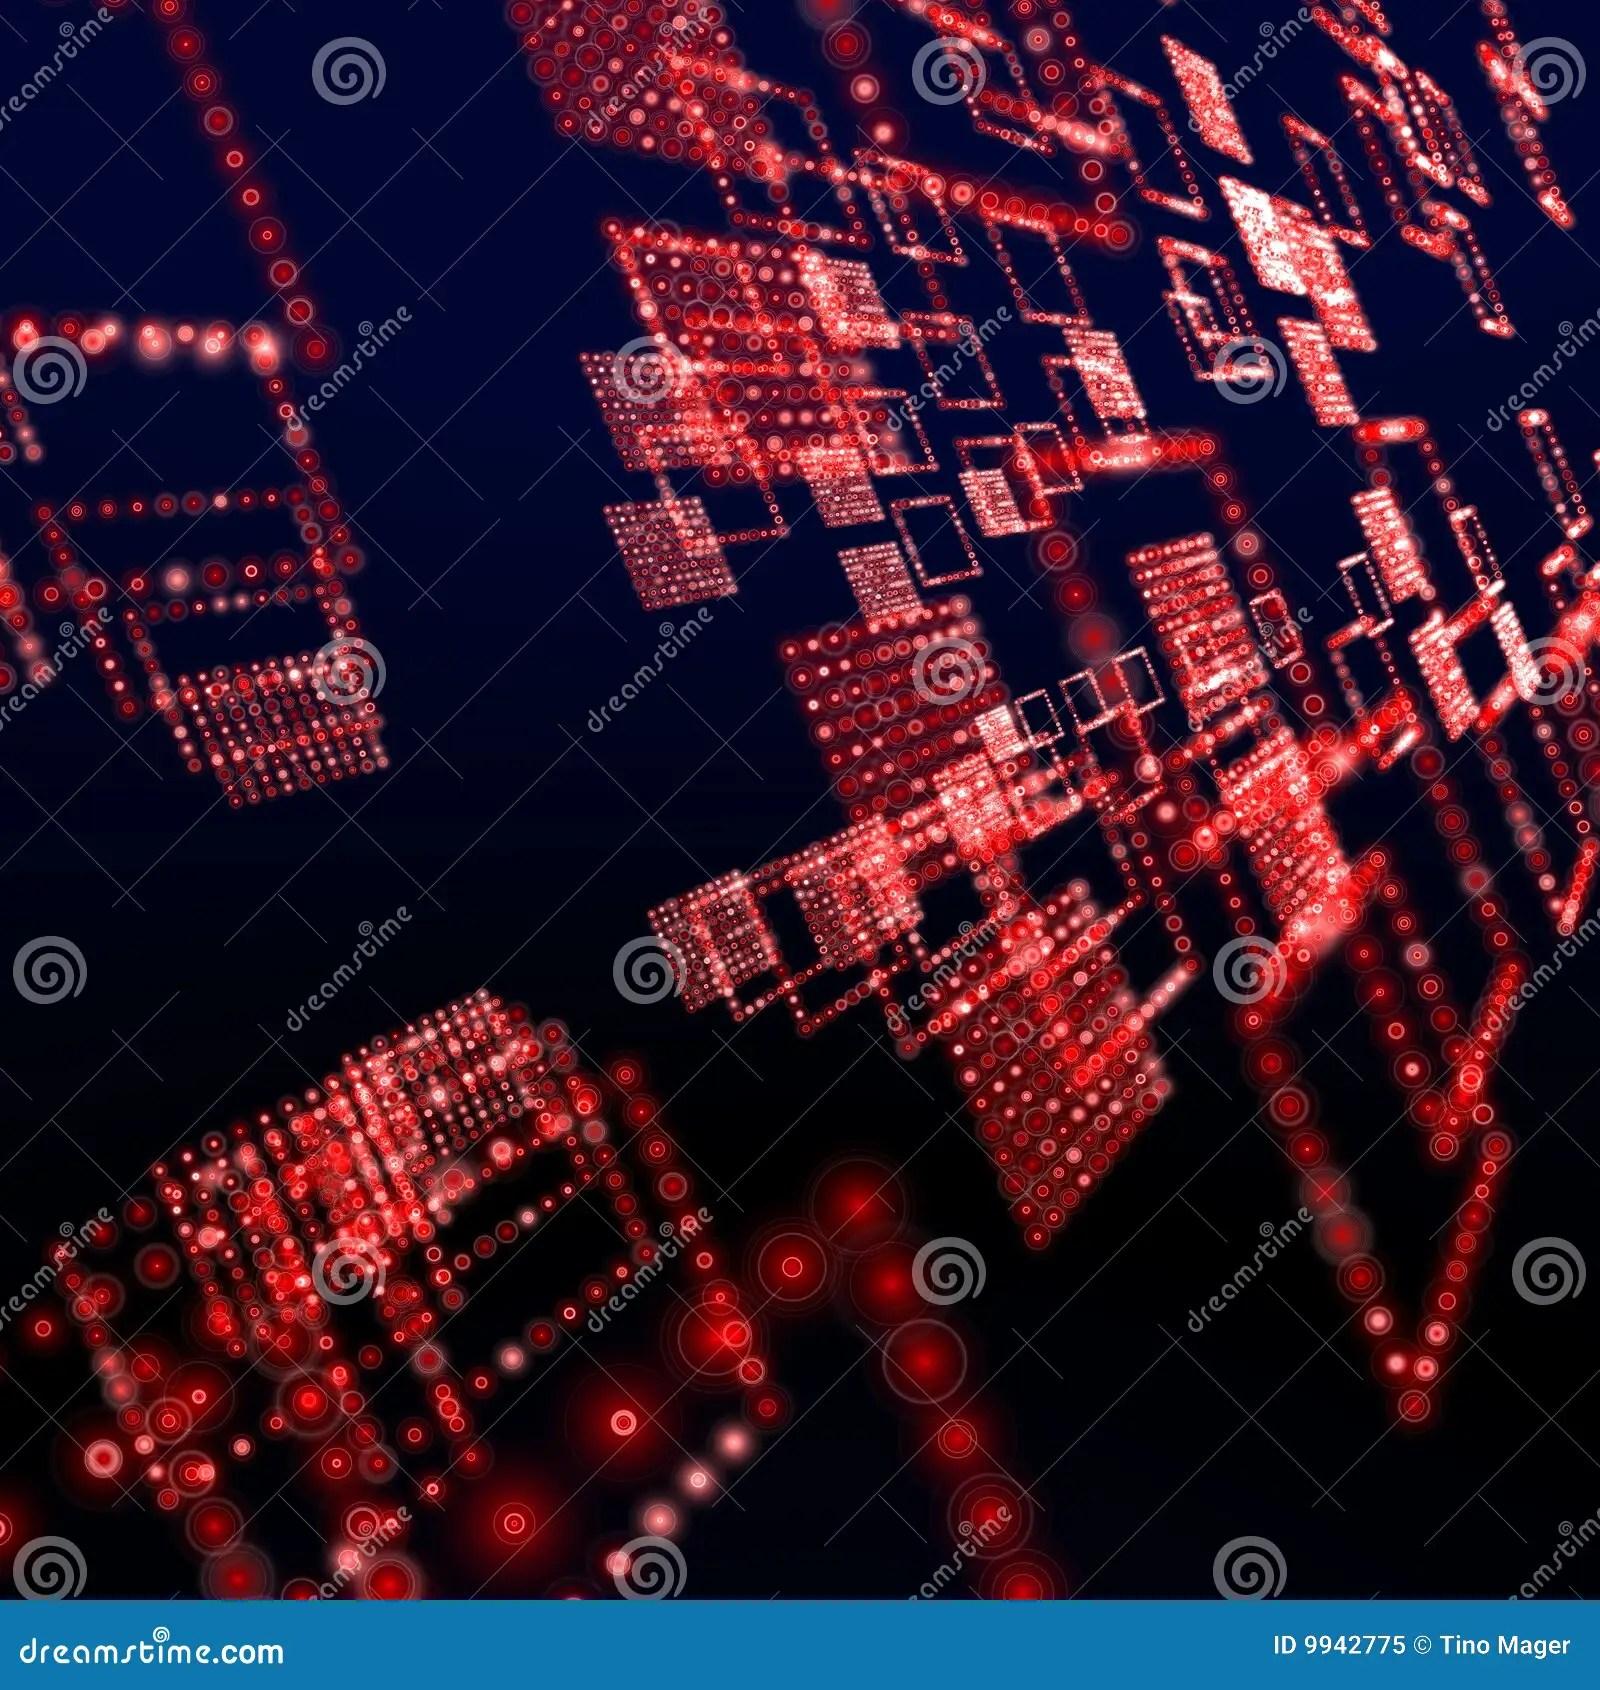 Red Matrix Wallpaper Royalty Free Stock Photo  Image 9942775